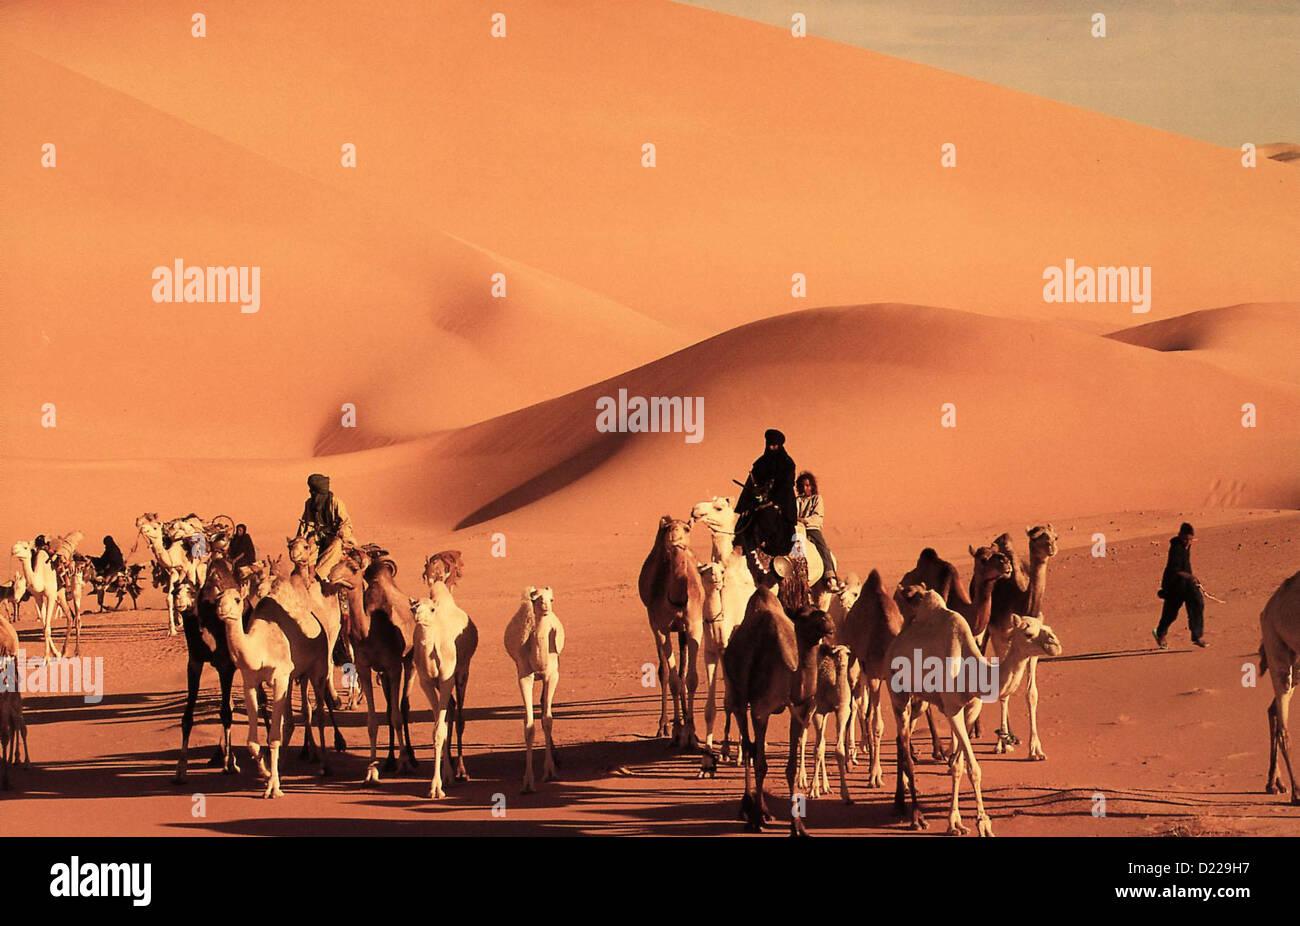 Imuhar  Imuhar  Szene Der 11-jaehrige Khenan, halb Tuareg, halb Franzose, ist in Paris aufgewachsen. Nach dem Tod - Stock Image